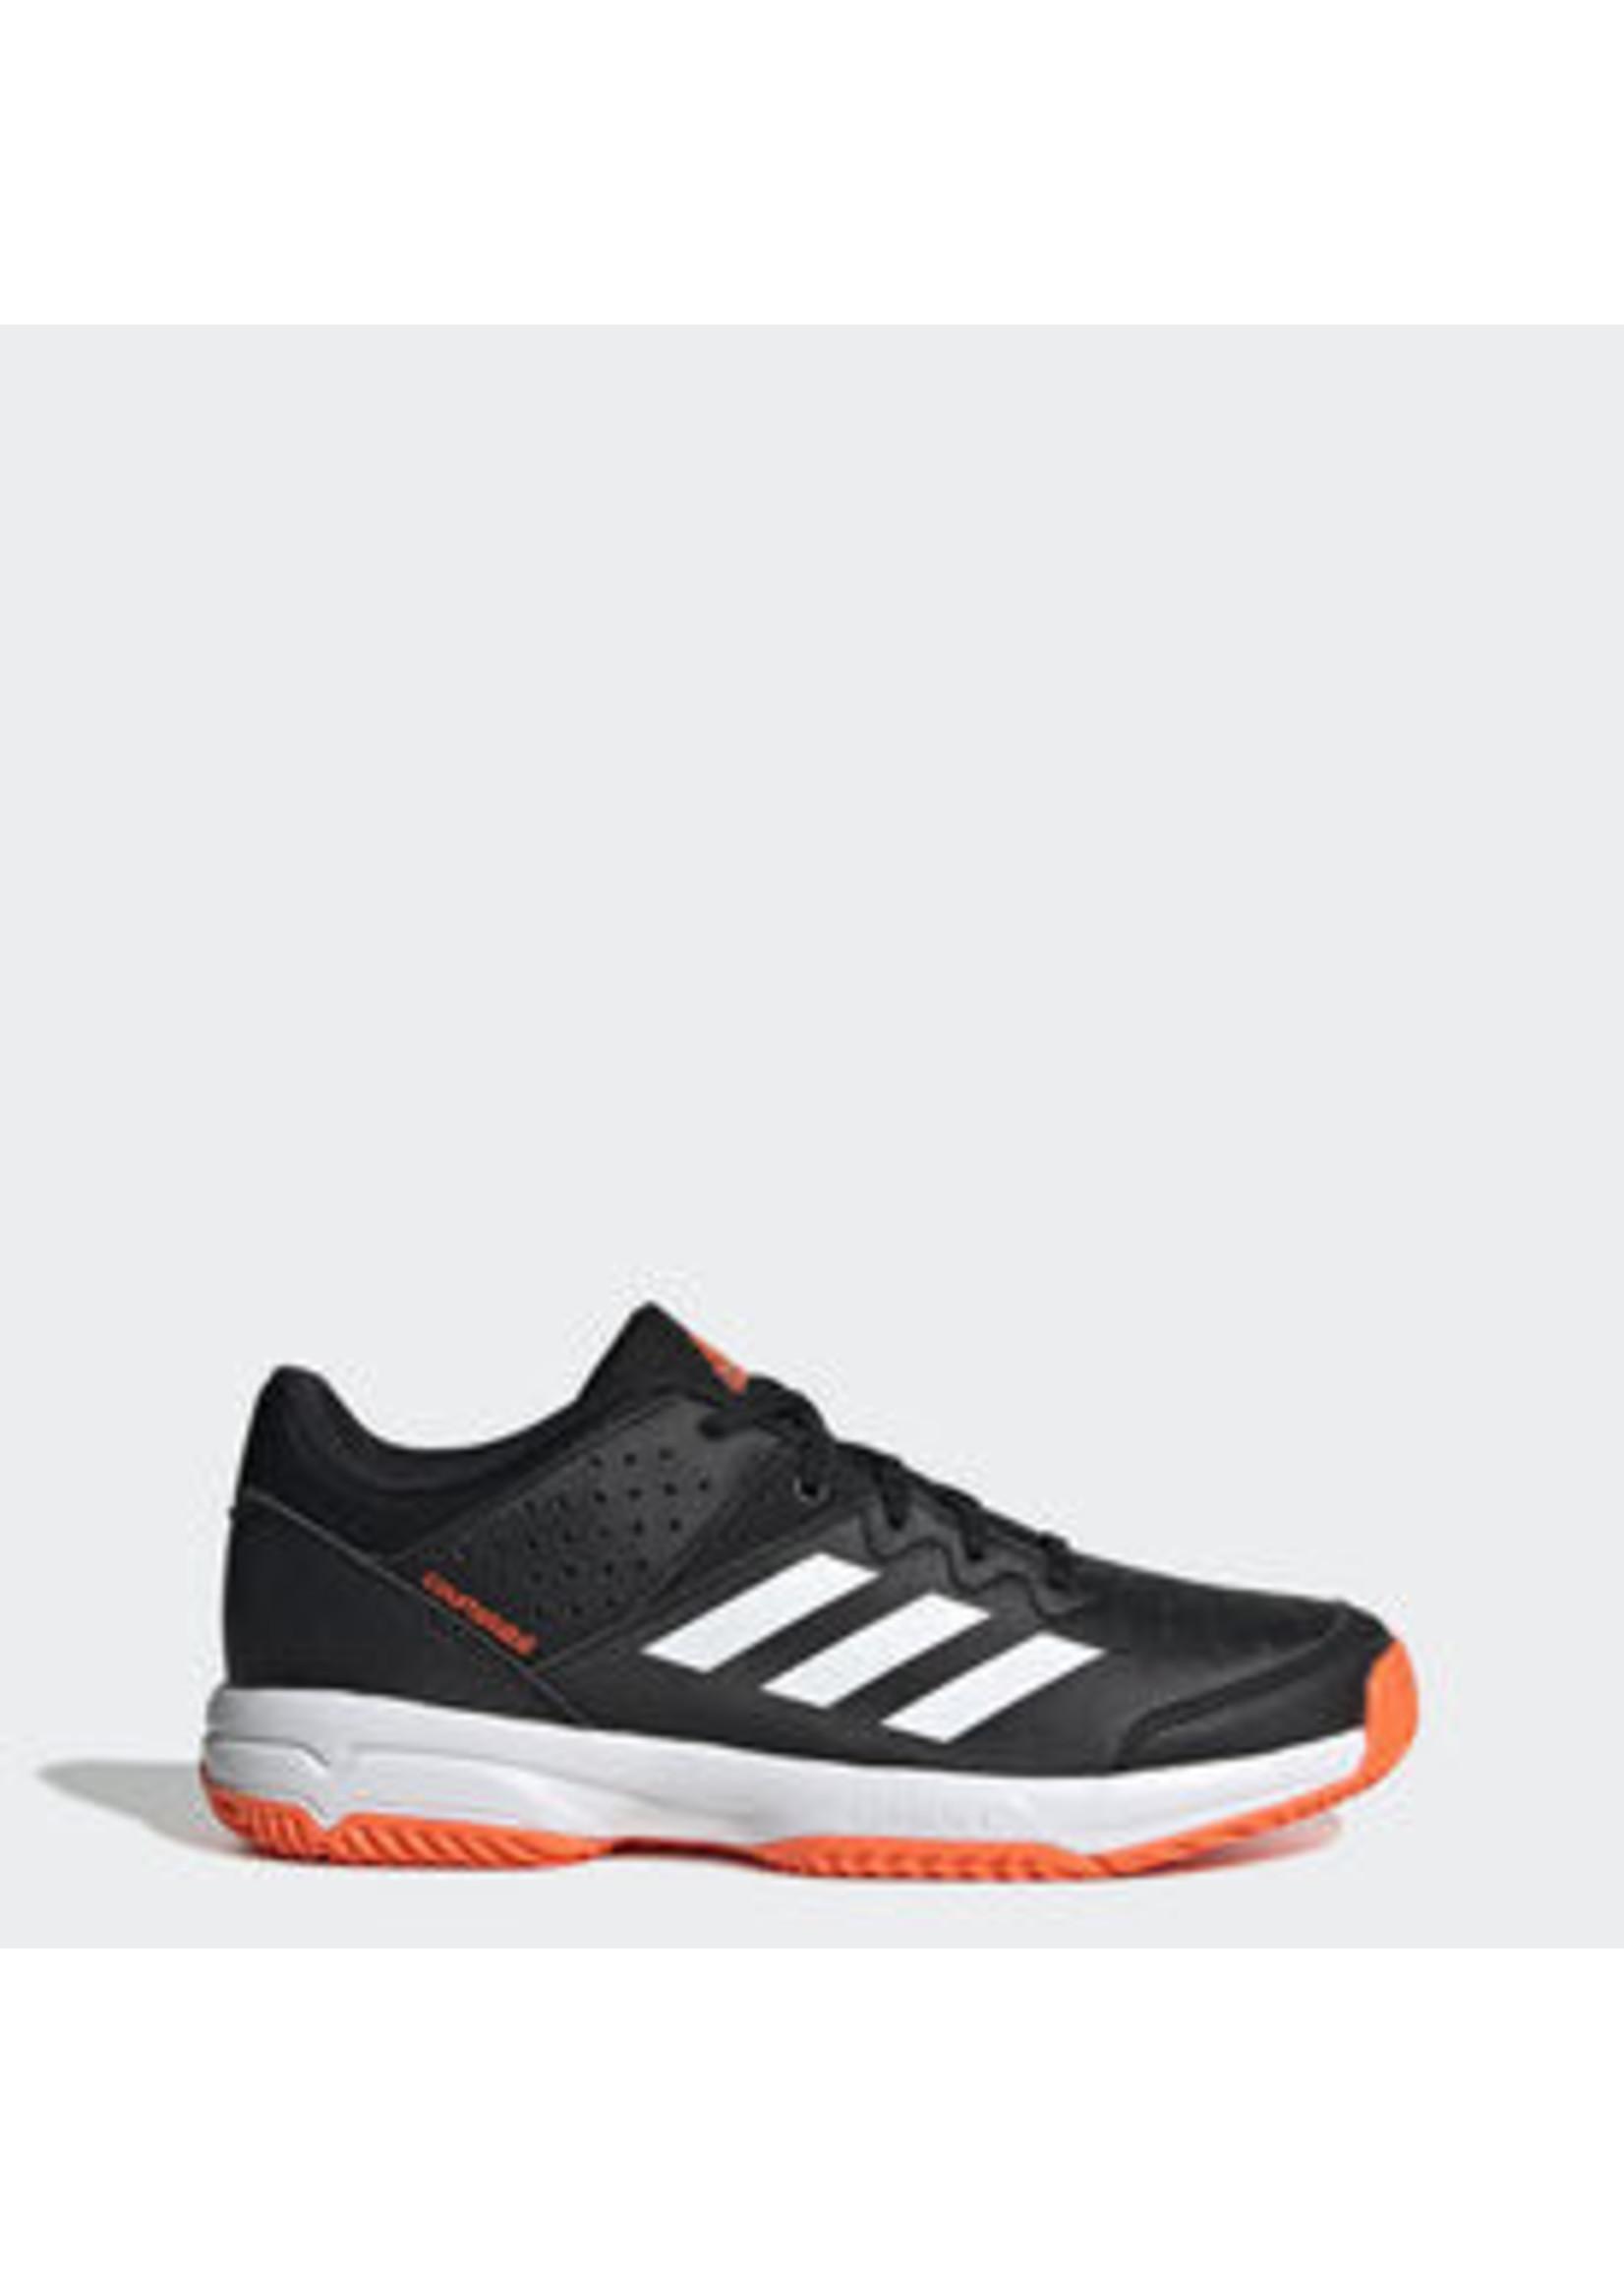 Adidas Adidas Court Stabil Jr Indoor Shoe (2019) - Black